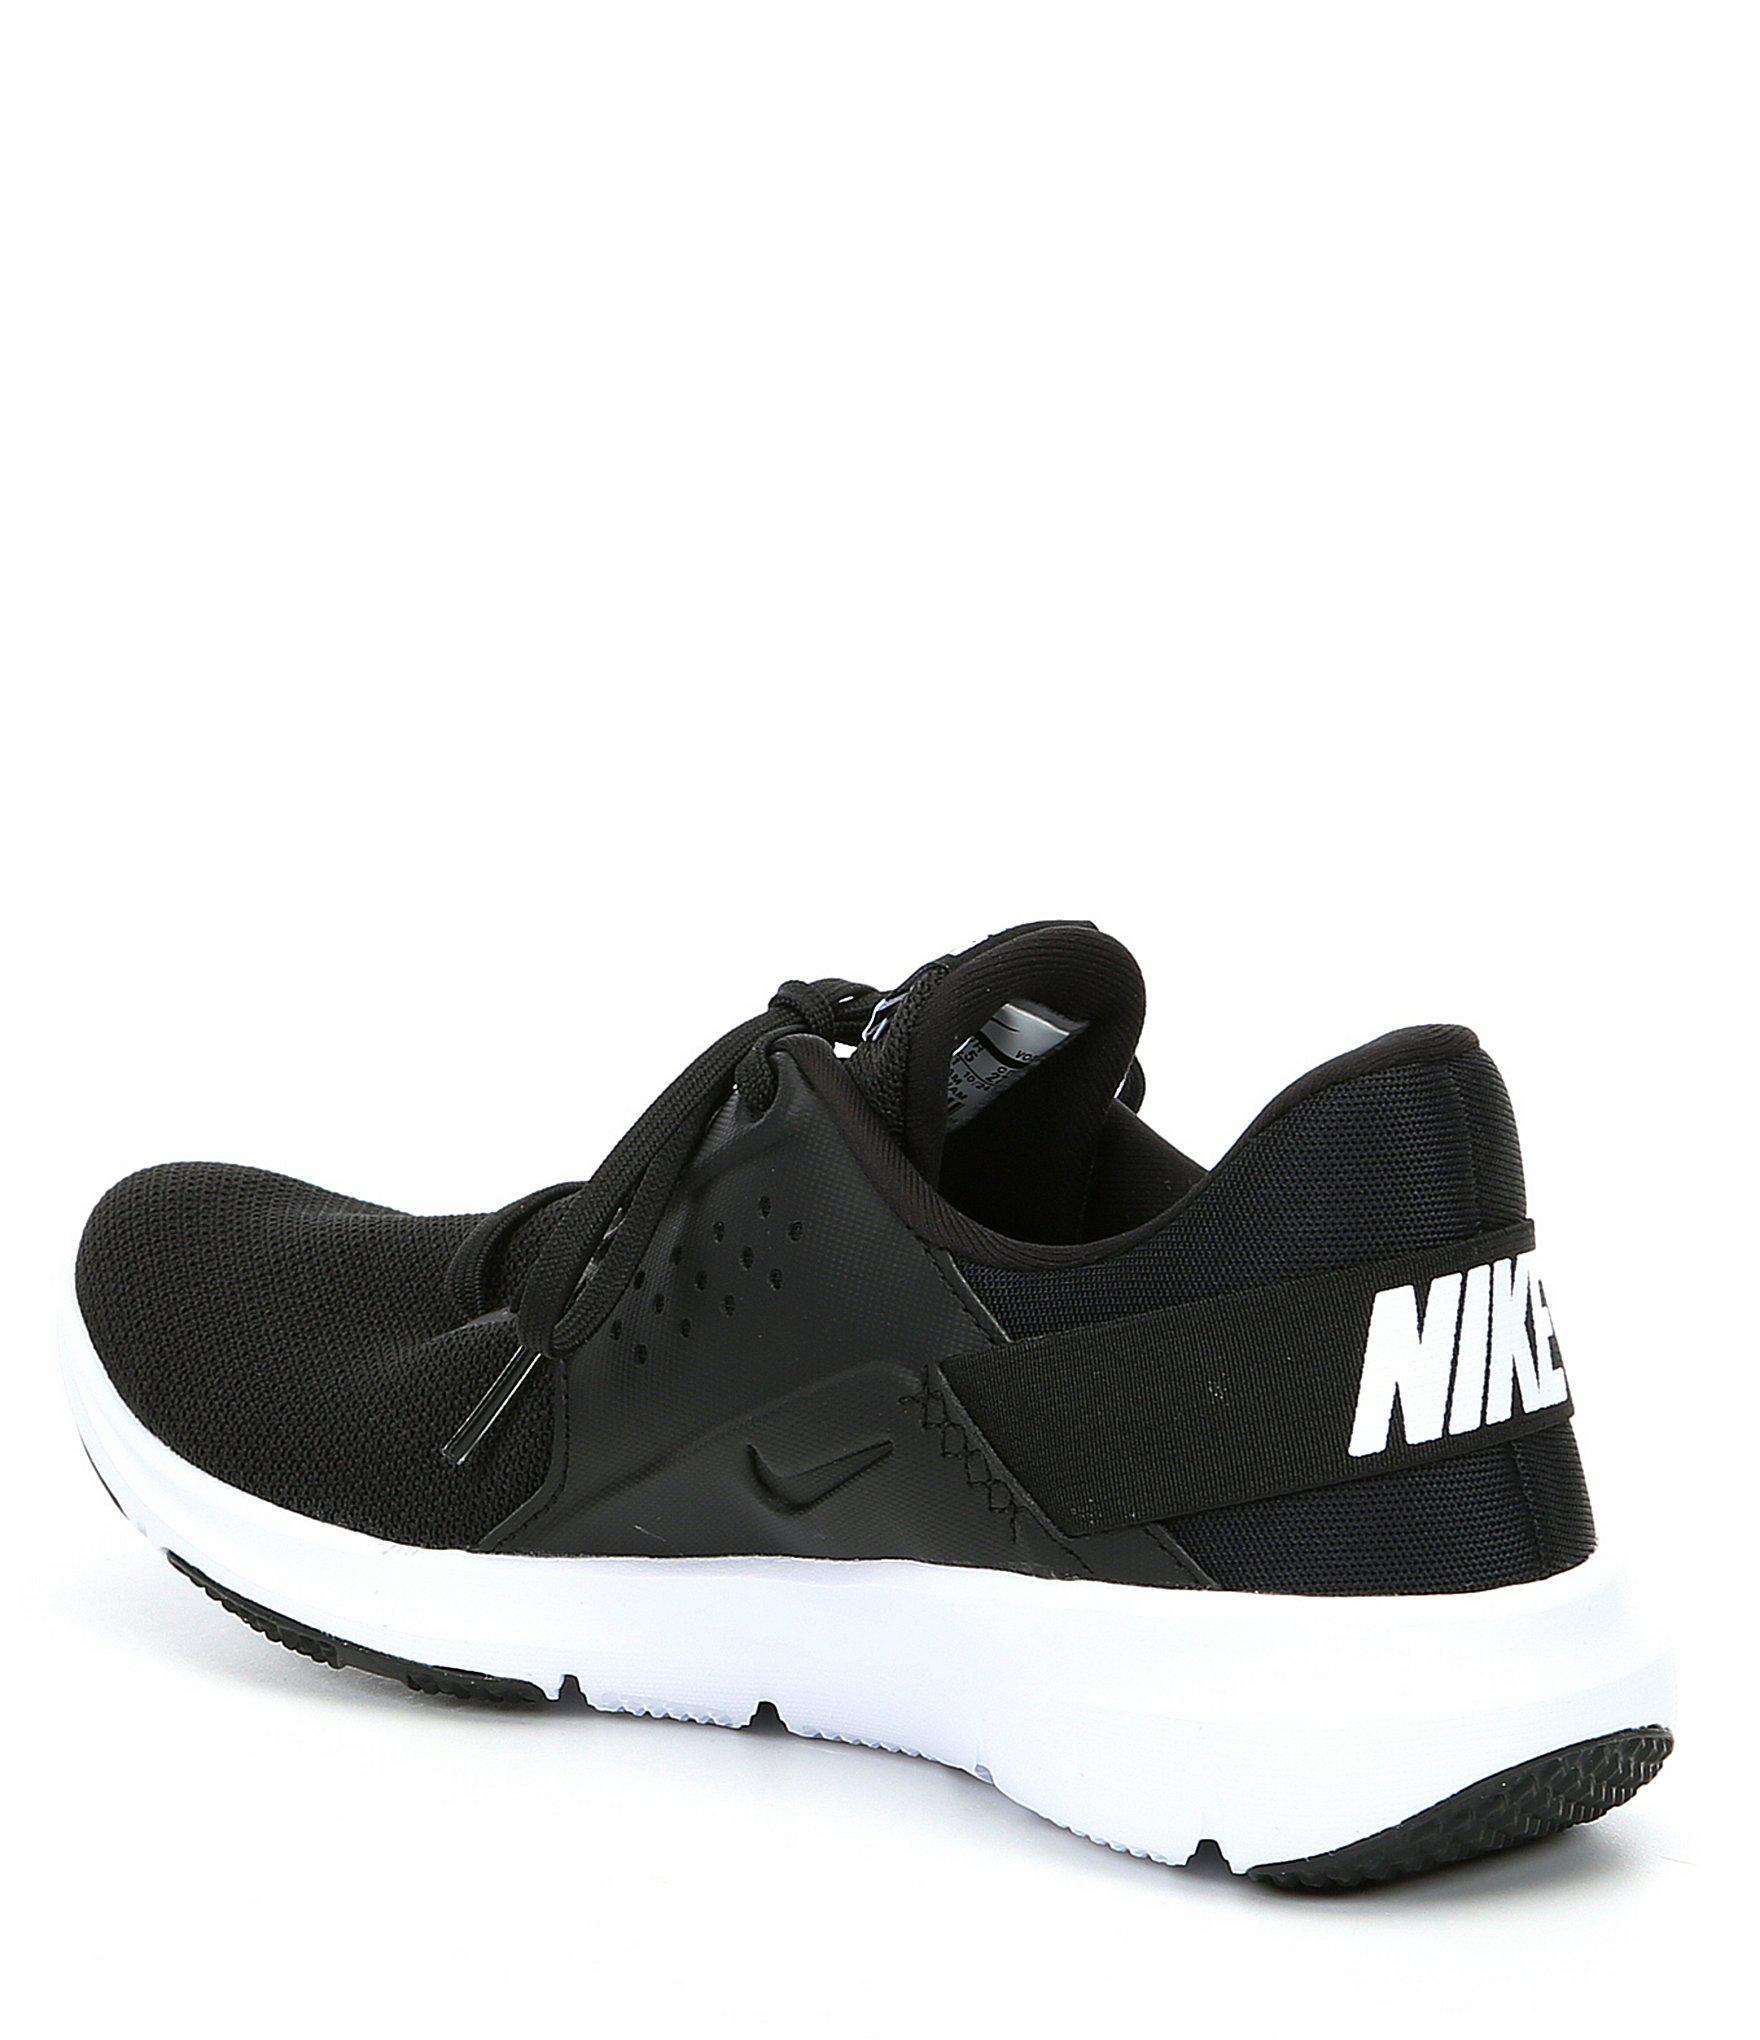 a80873640 Nike Männer Trainingsschuh Männer für Flex Tr Control Lyst Vollbild 3 Black  anzeigen r8nfW17wrq